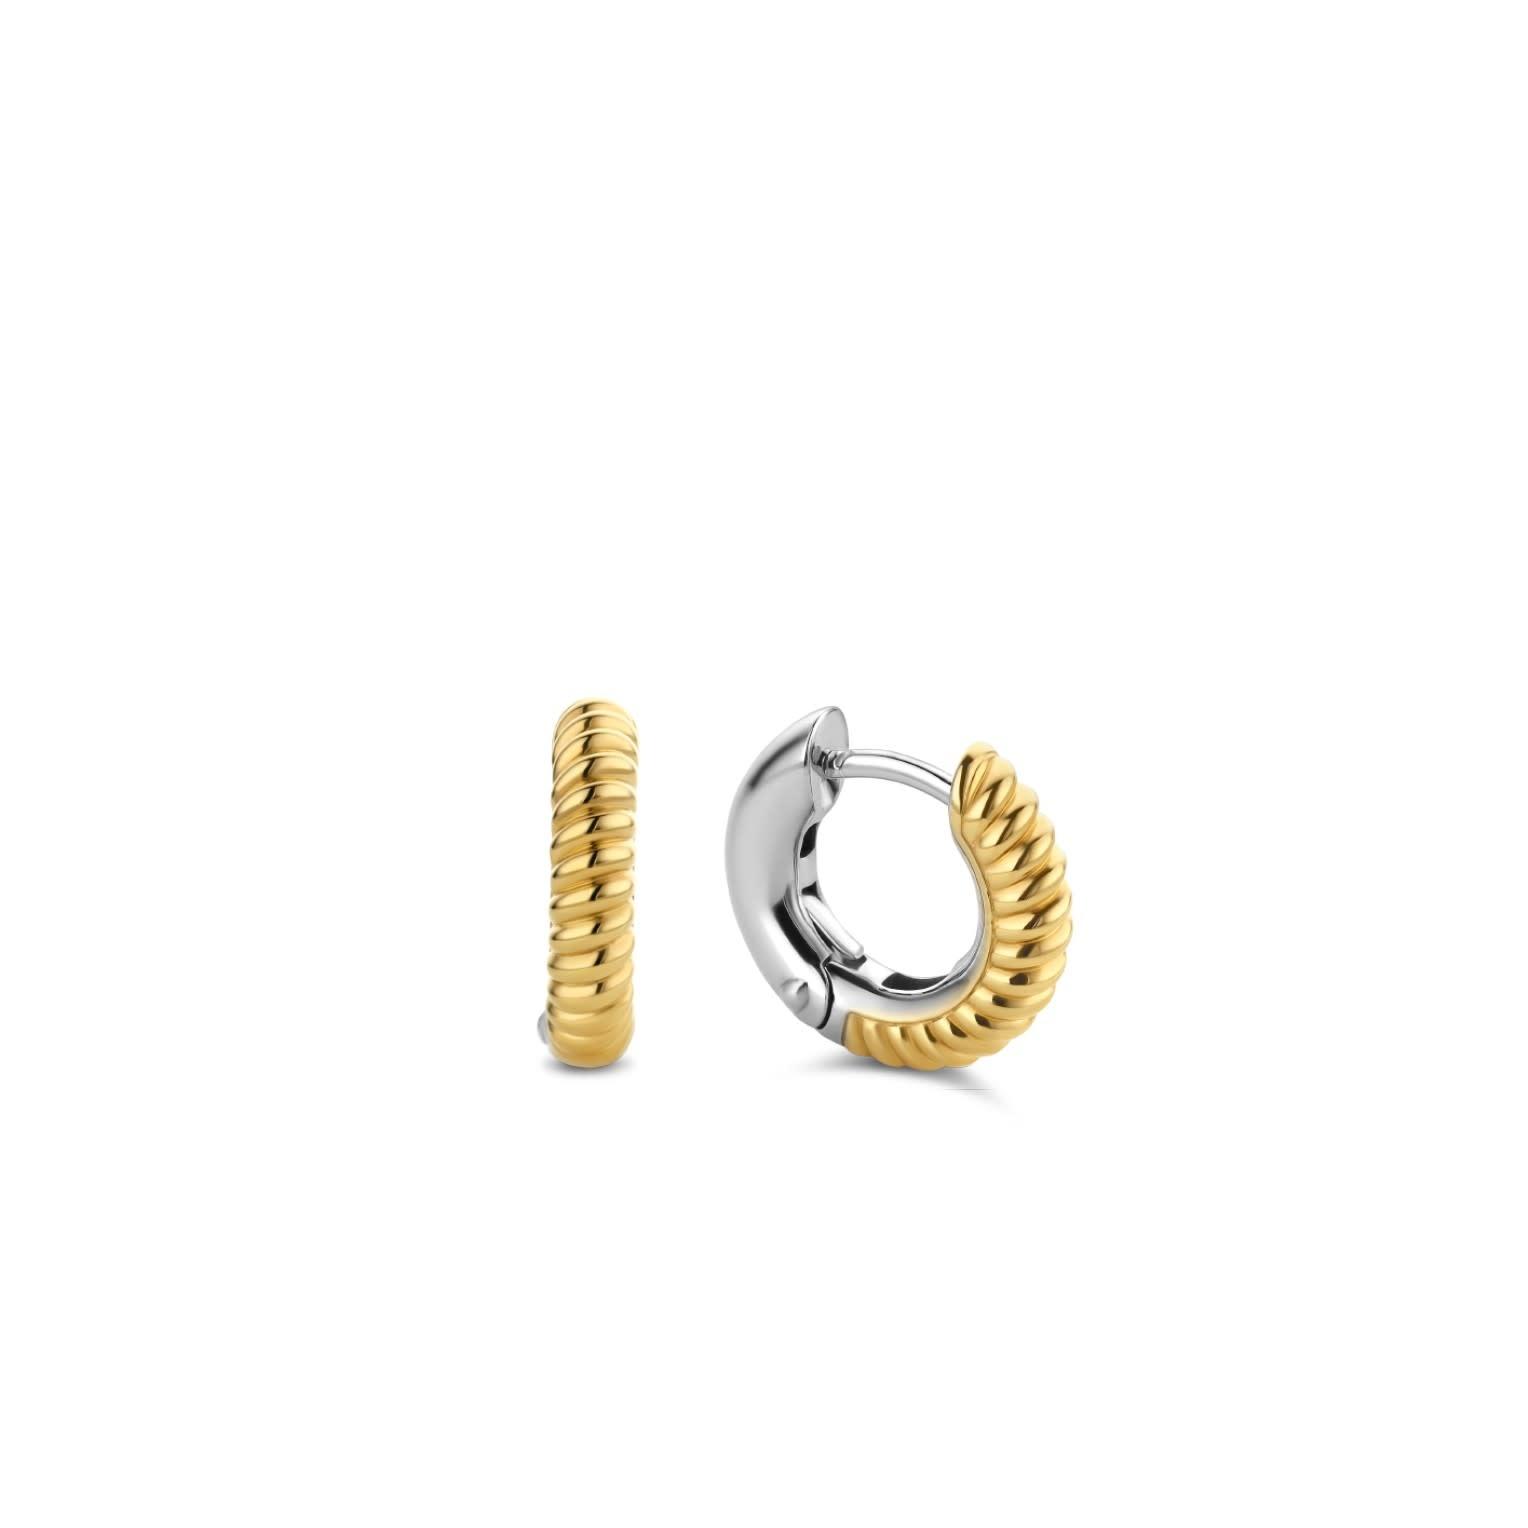 TI SENTO - Milano Earrings 7210YT-1